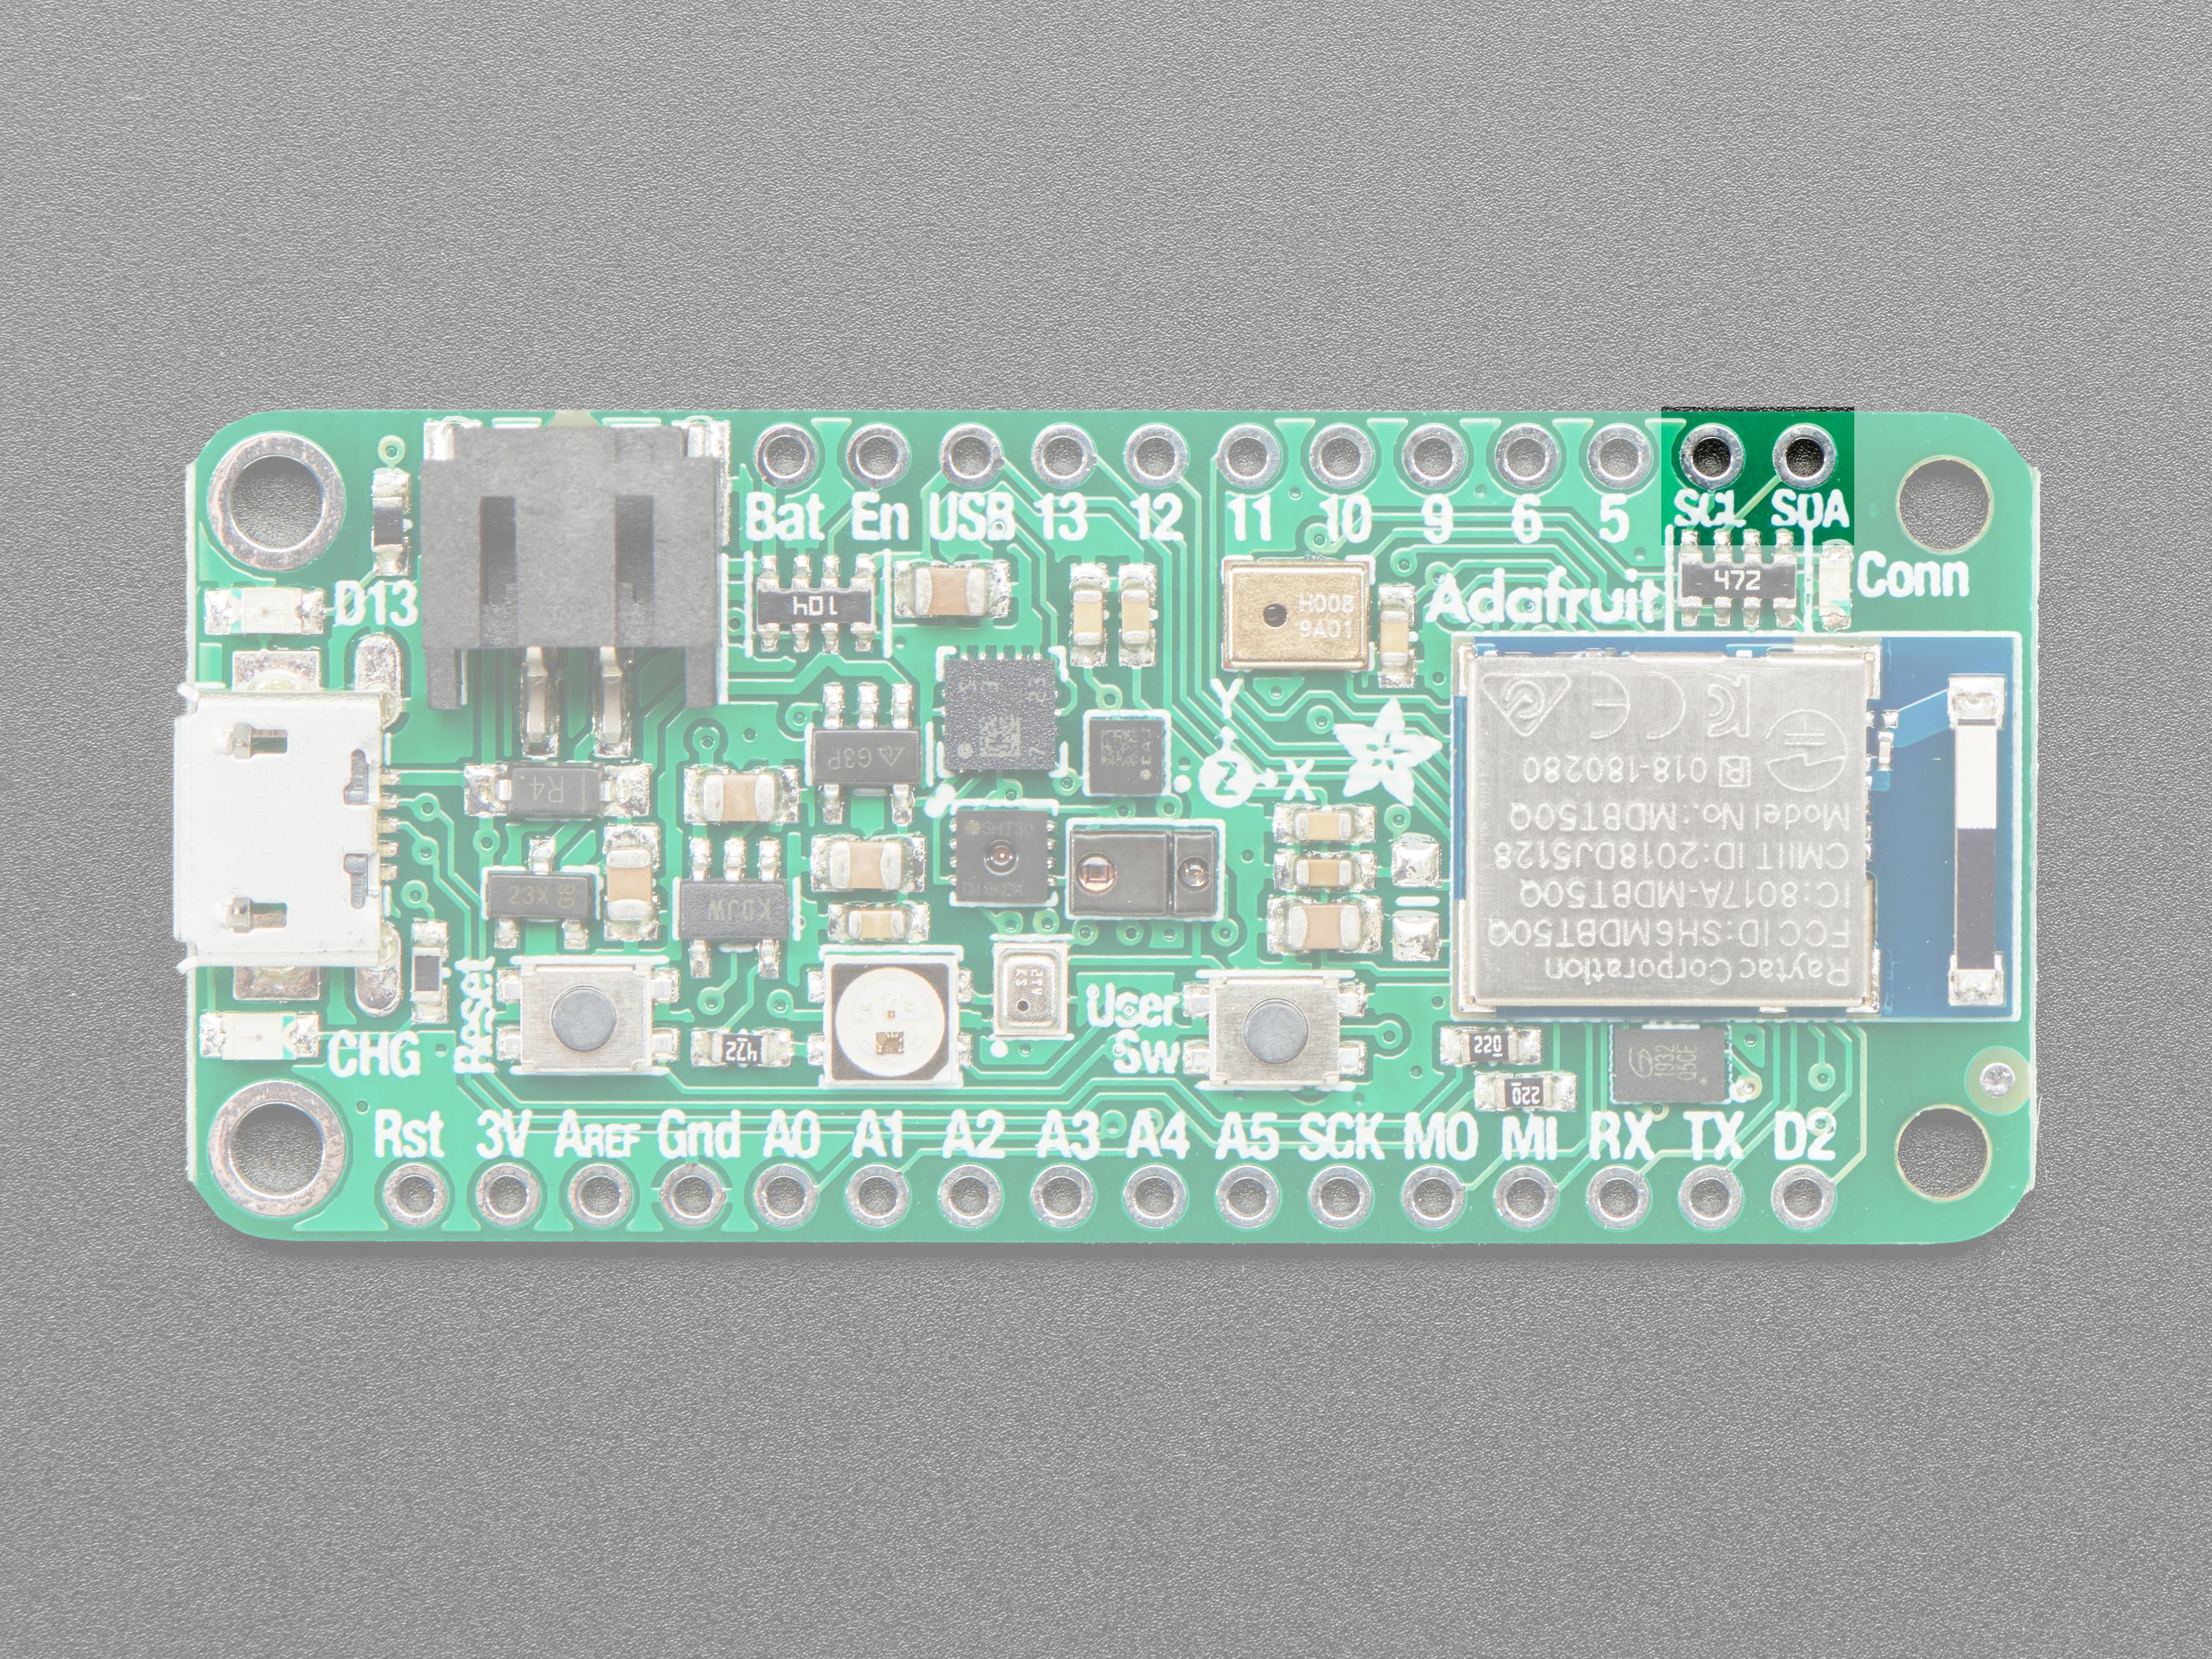 sensors_Feather_Sense_pinouts_I2C.jpg